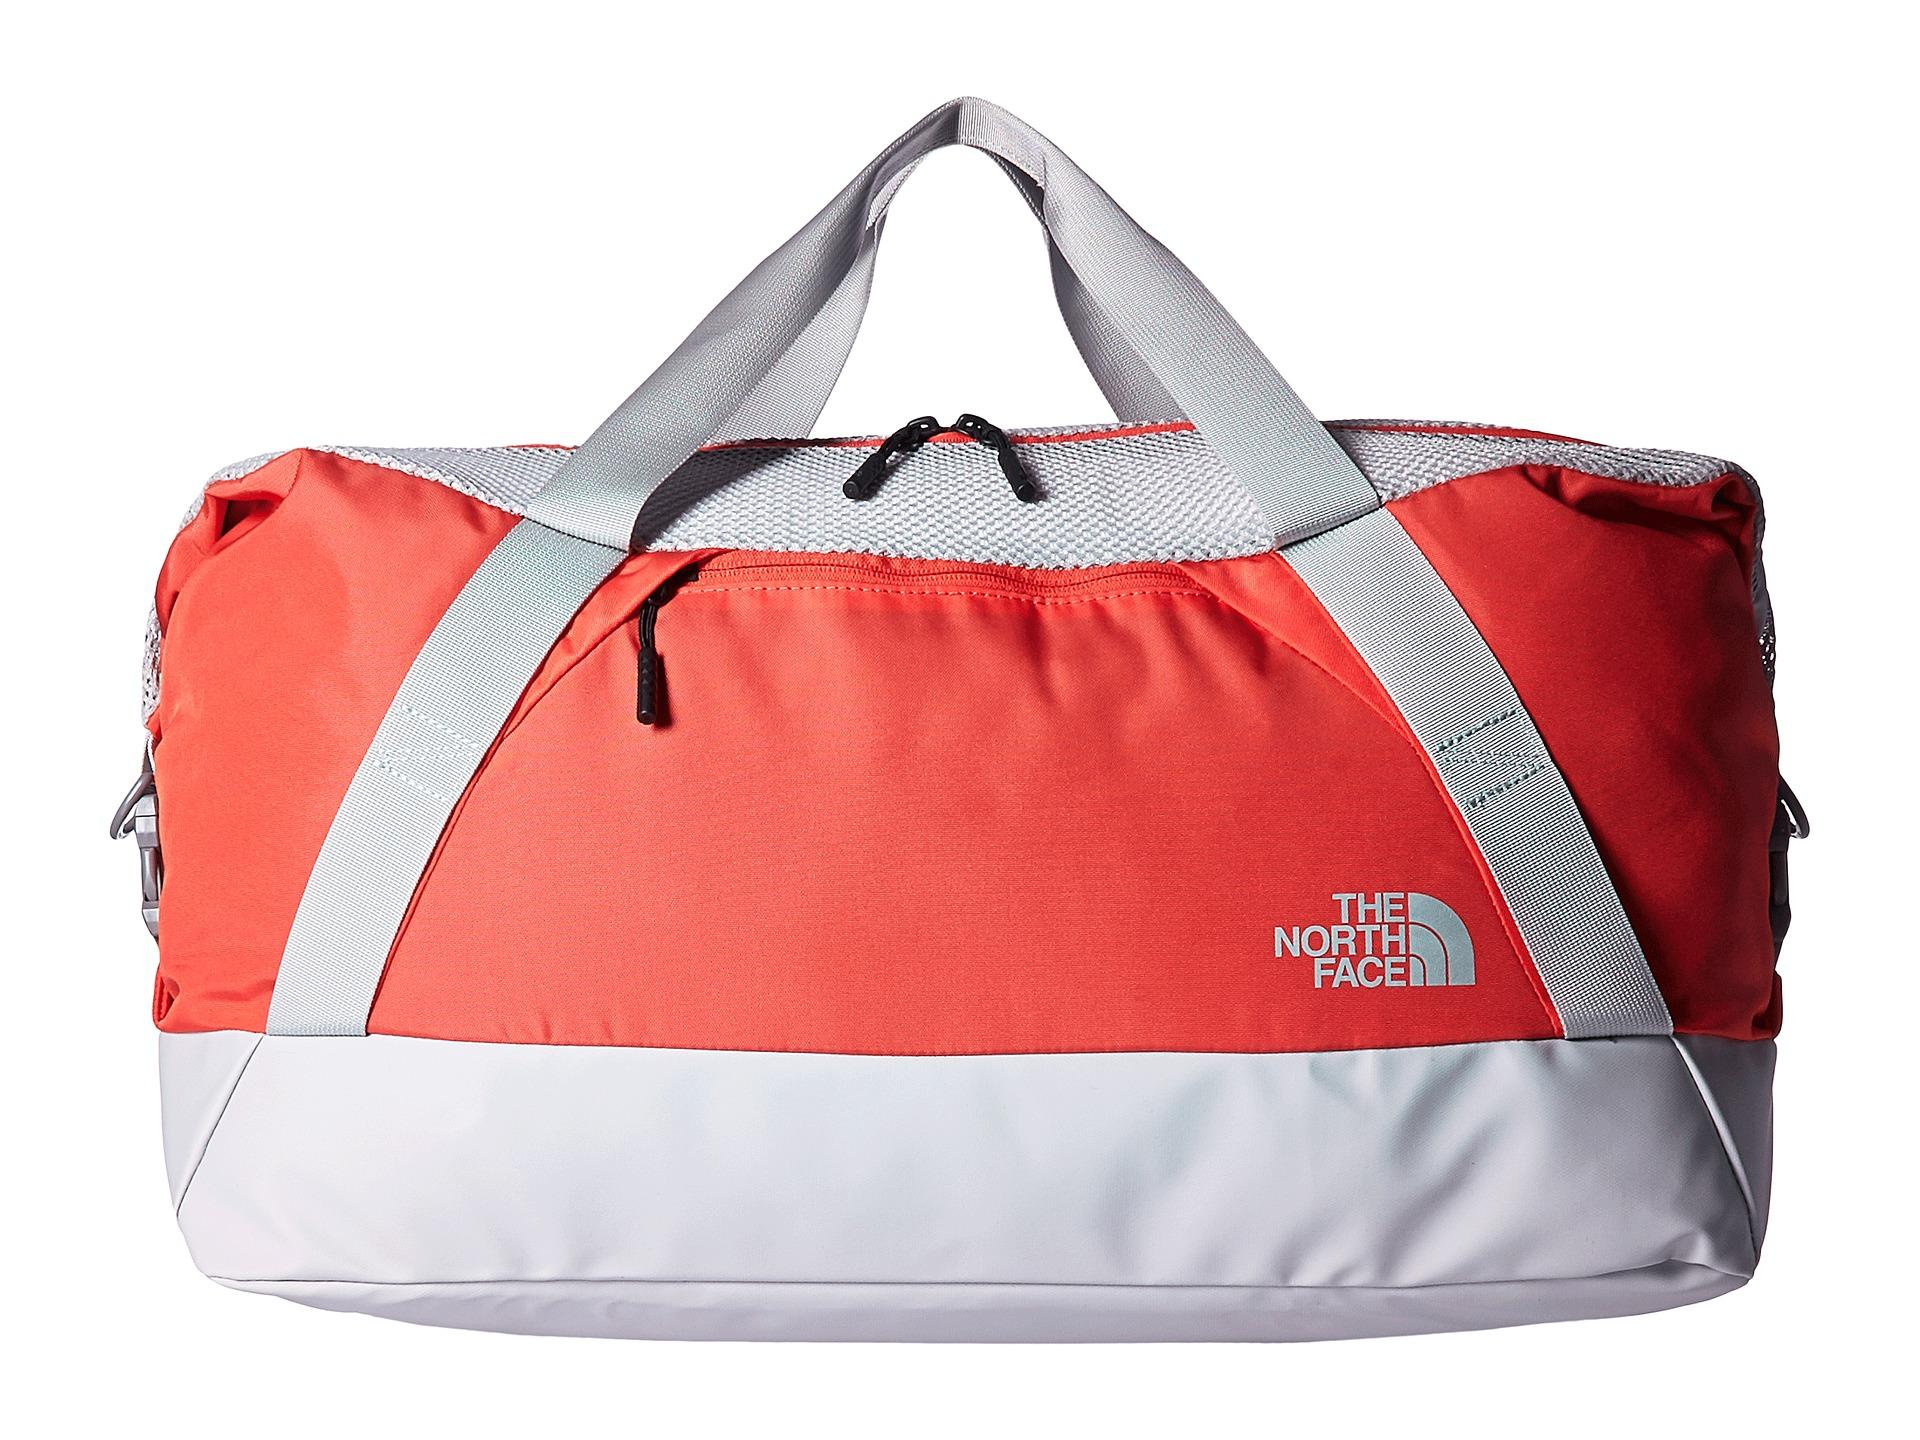 b47395d6ae01 Lyst - The North Face Apex Gym Duffel Bag - Medium in Red